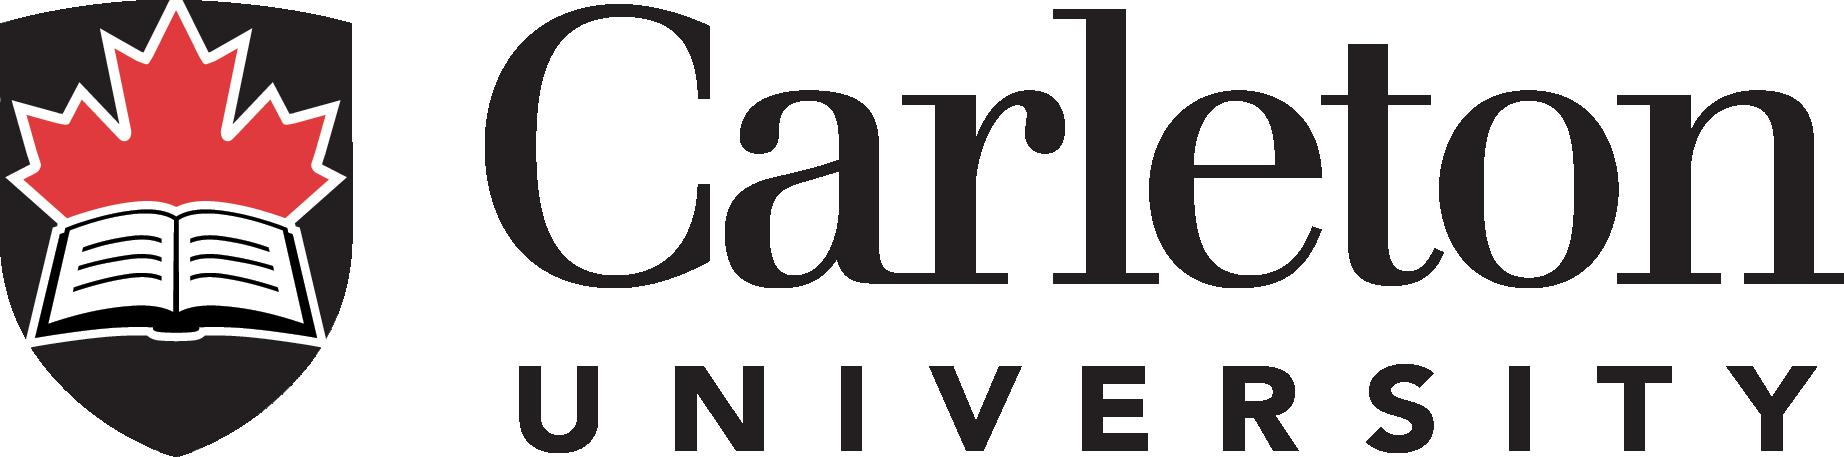 Carleton University logo - for Phils Sponsorship